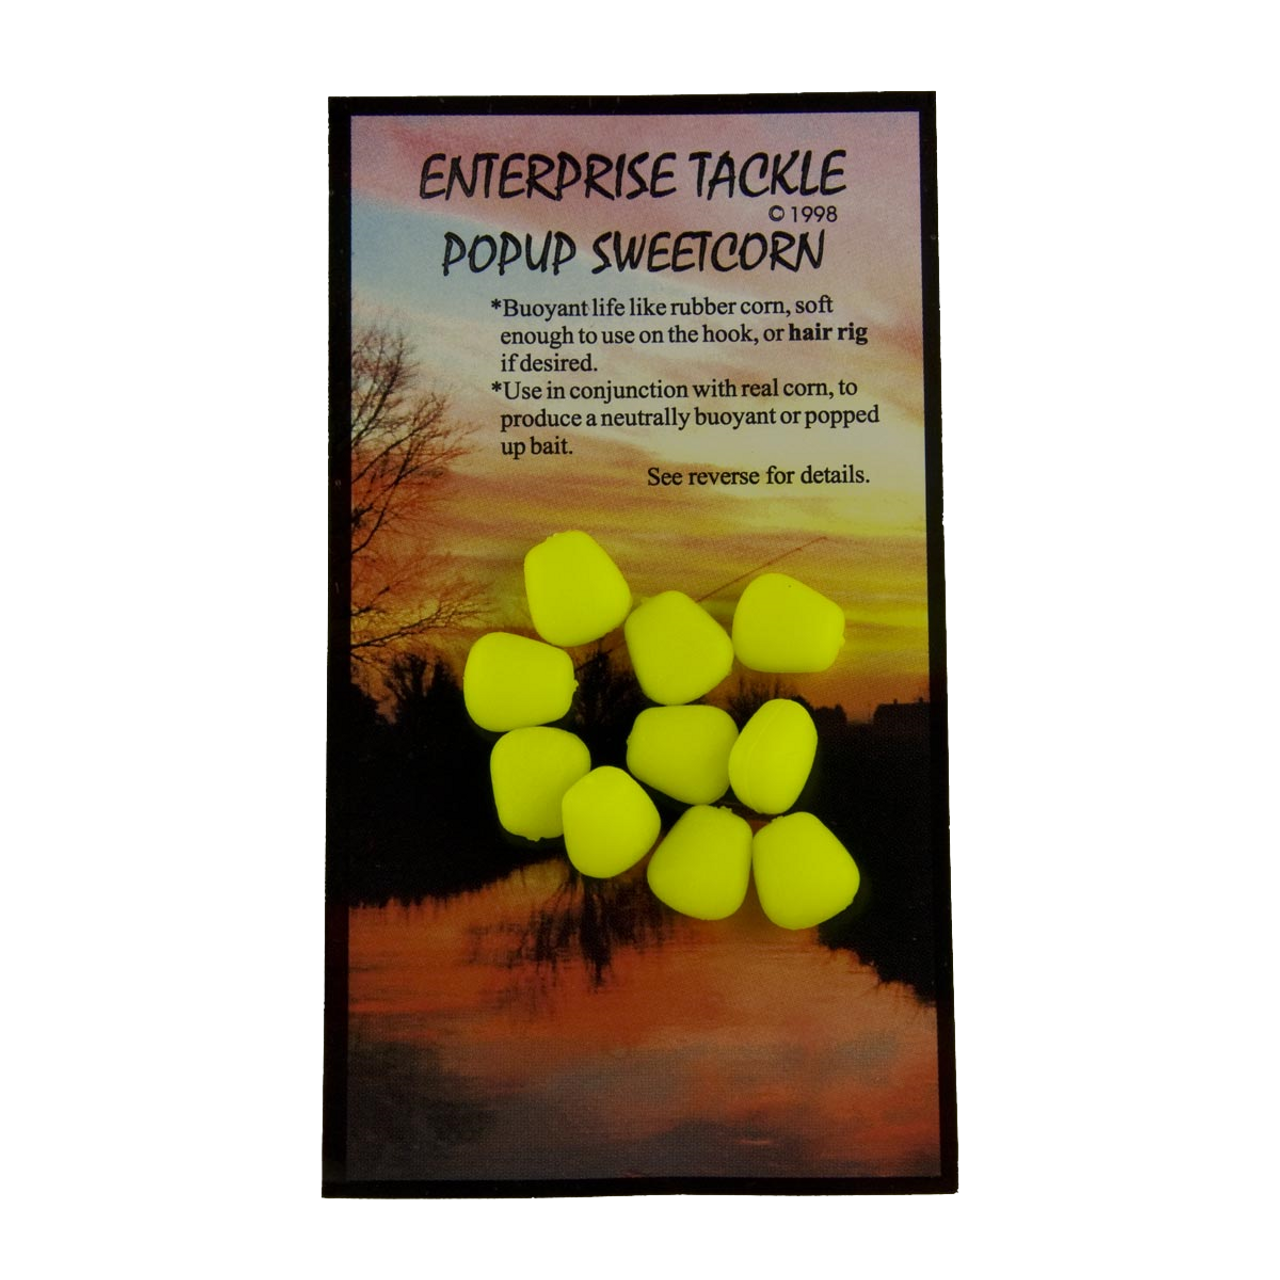 Enterprise  Popup Fluoro Yellow Sweetcorn